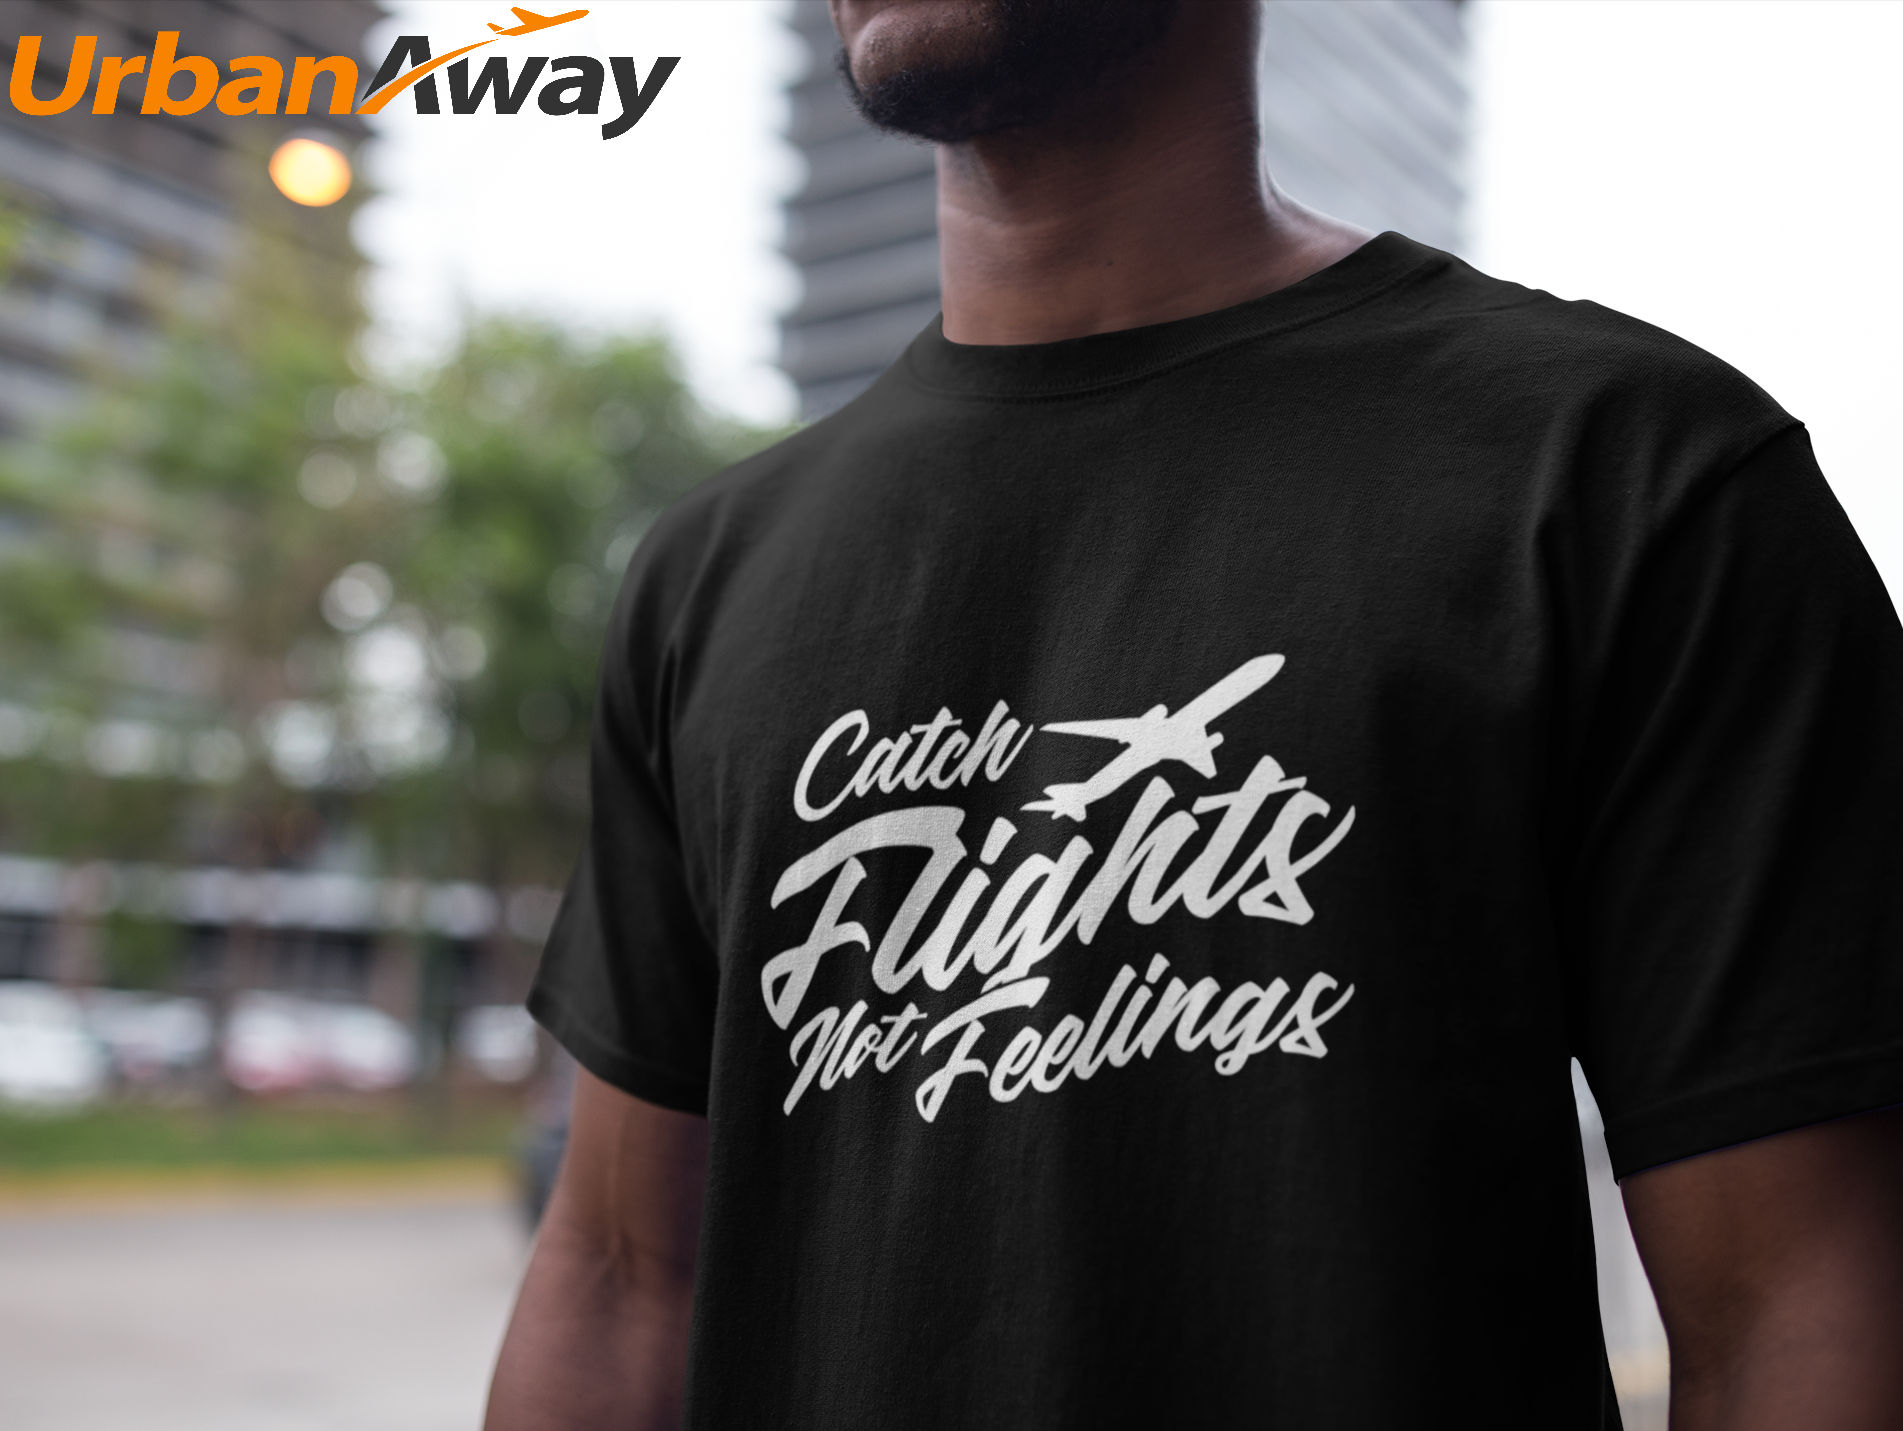 c0d594f7262 Catch Flights not Feelings T shirt